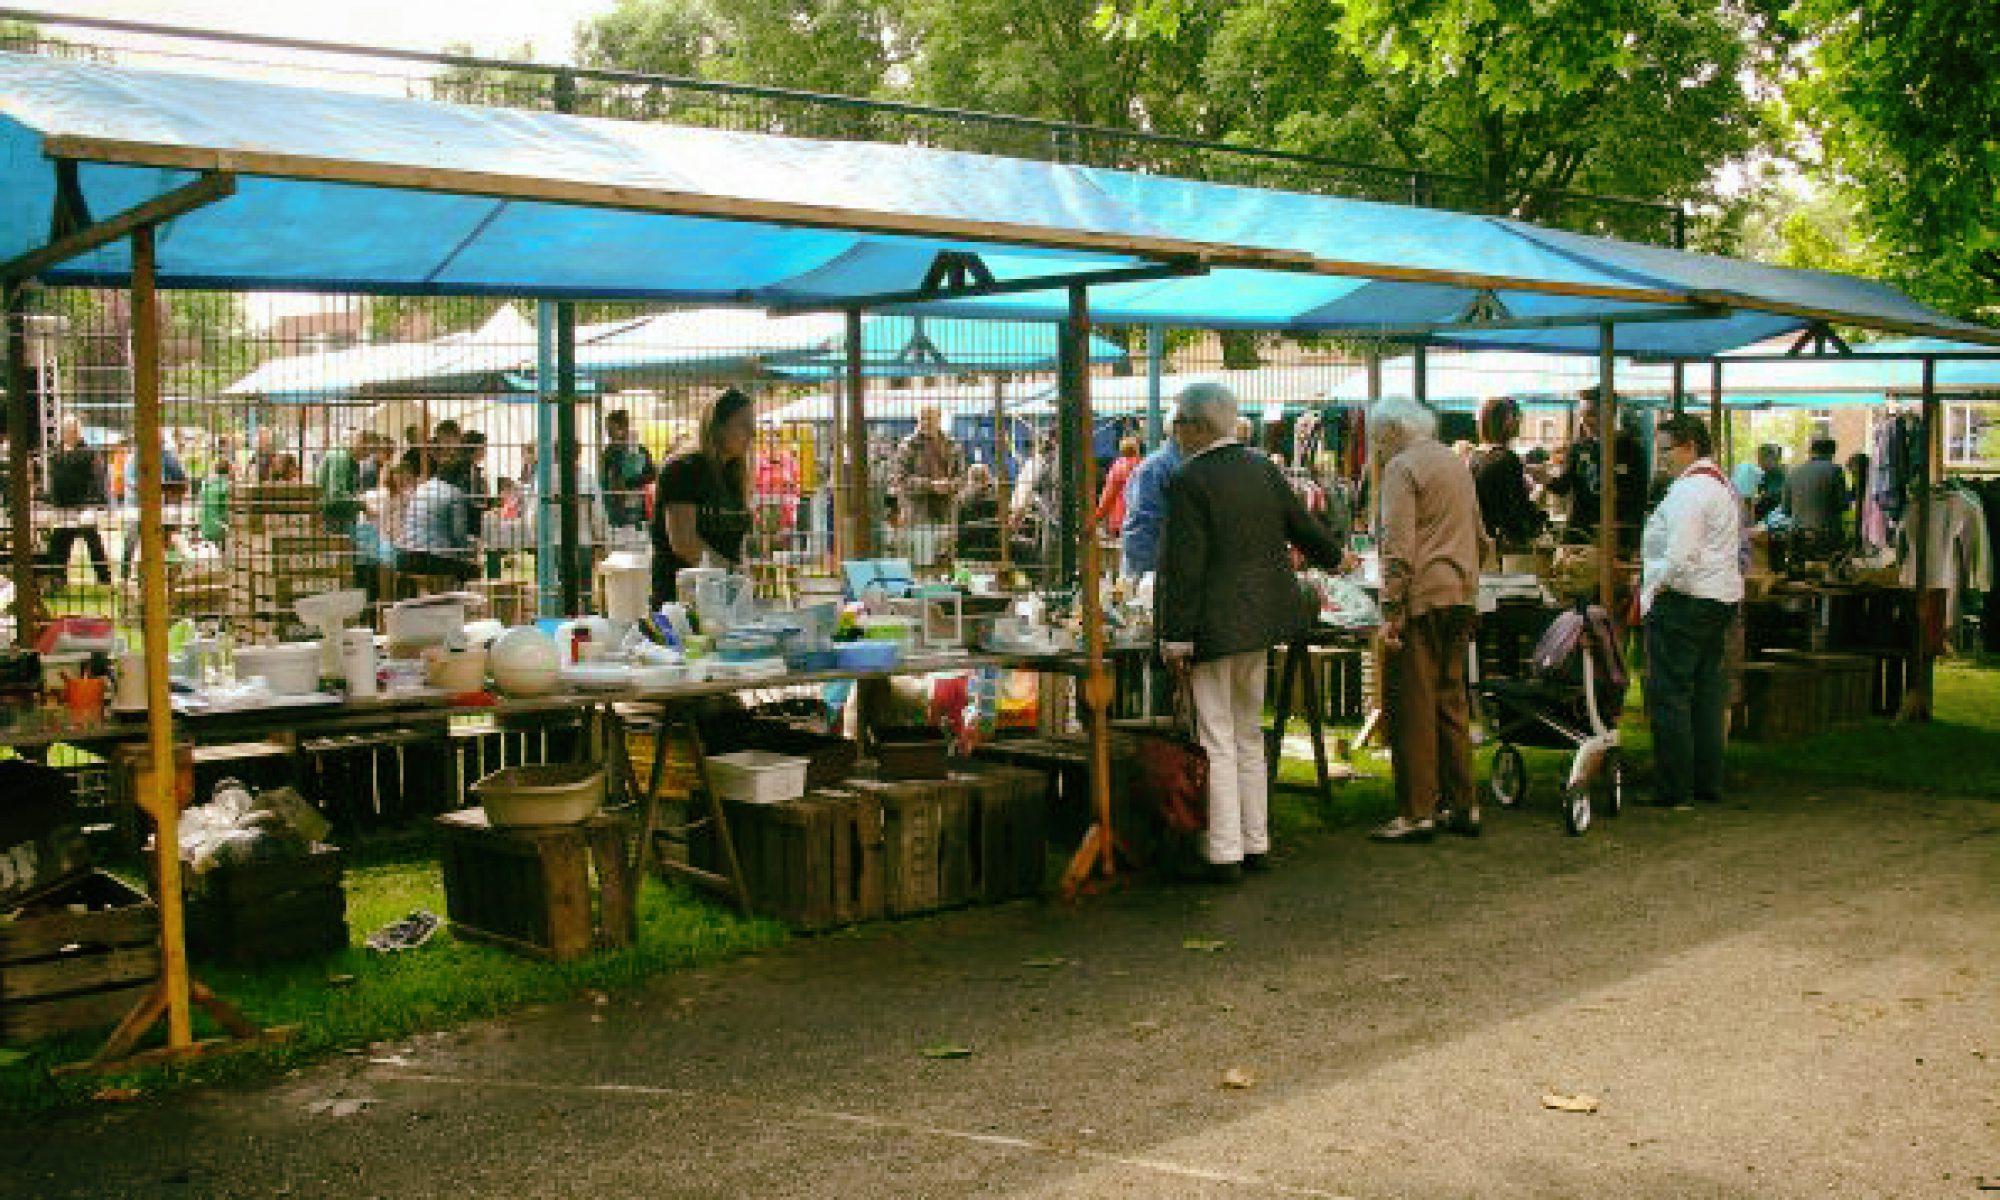 Eshofmarkt